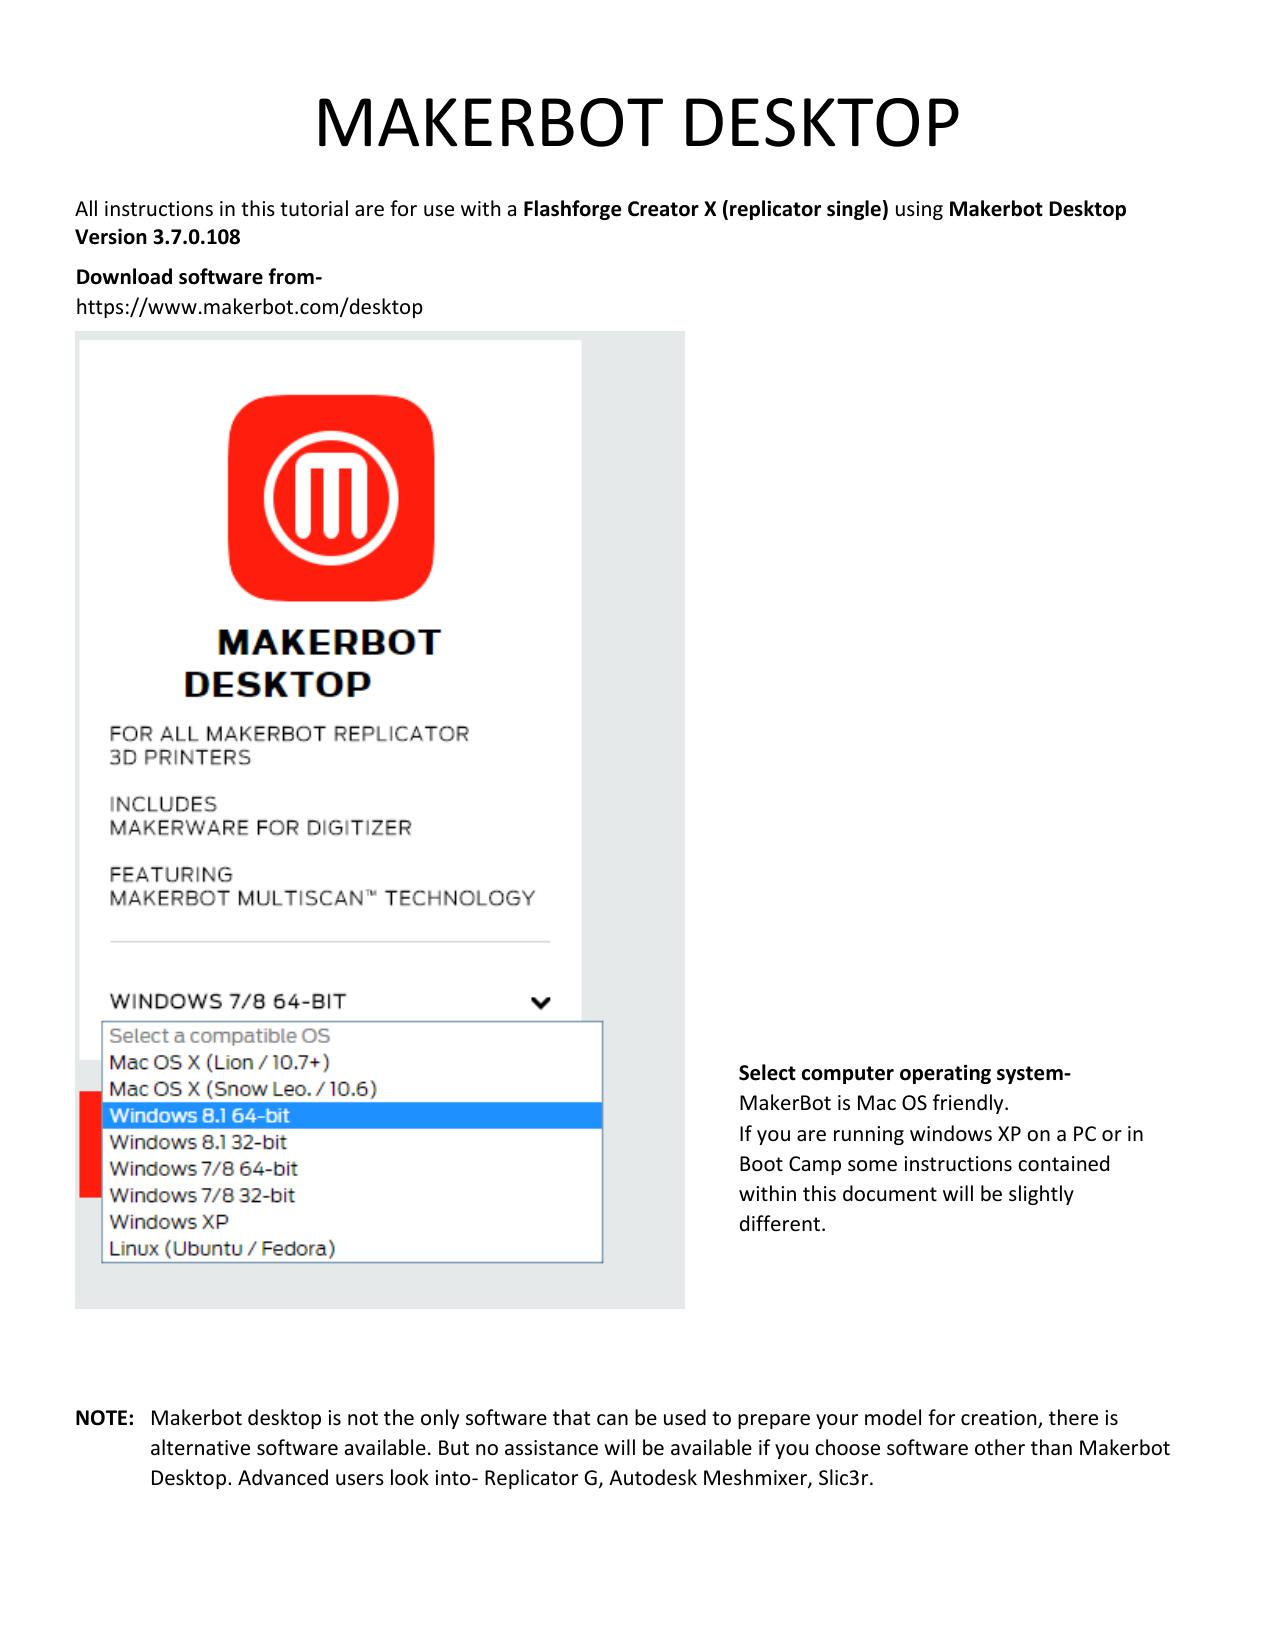 MAKERBOT DESKTOP | manualzz com